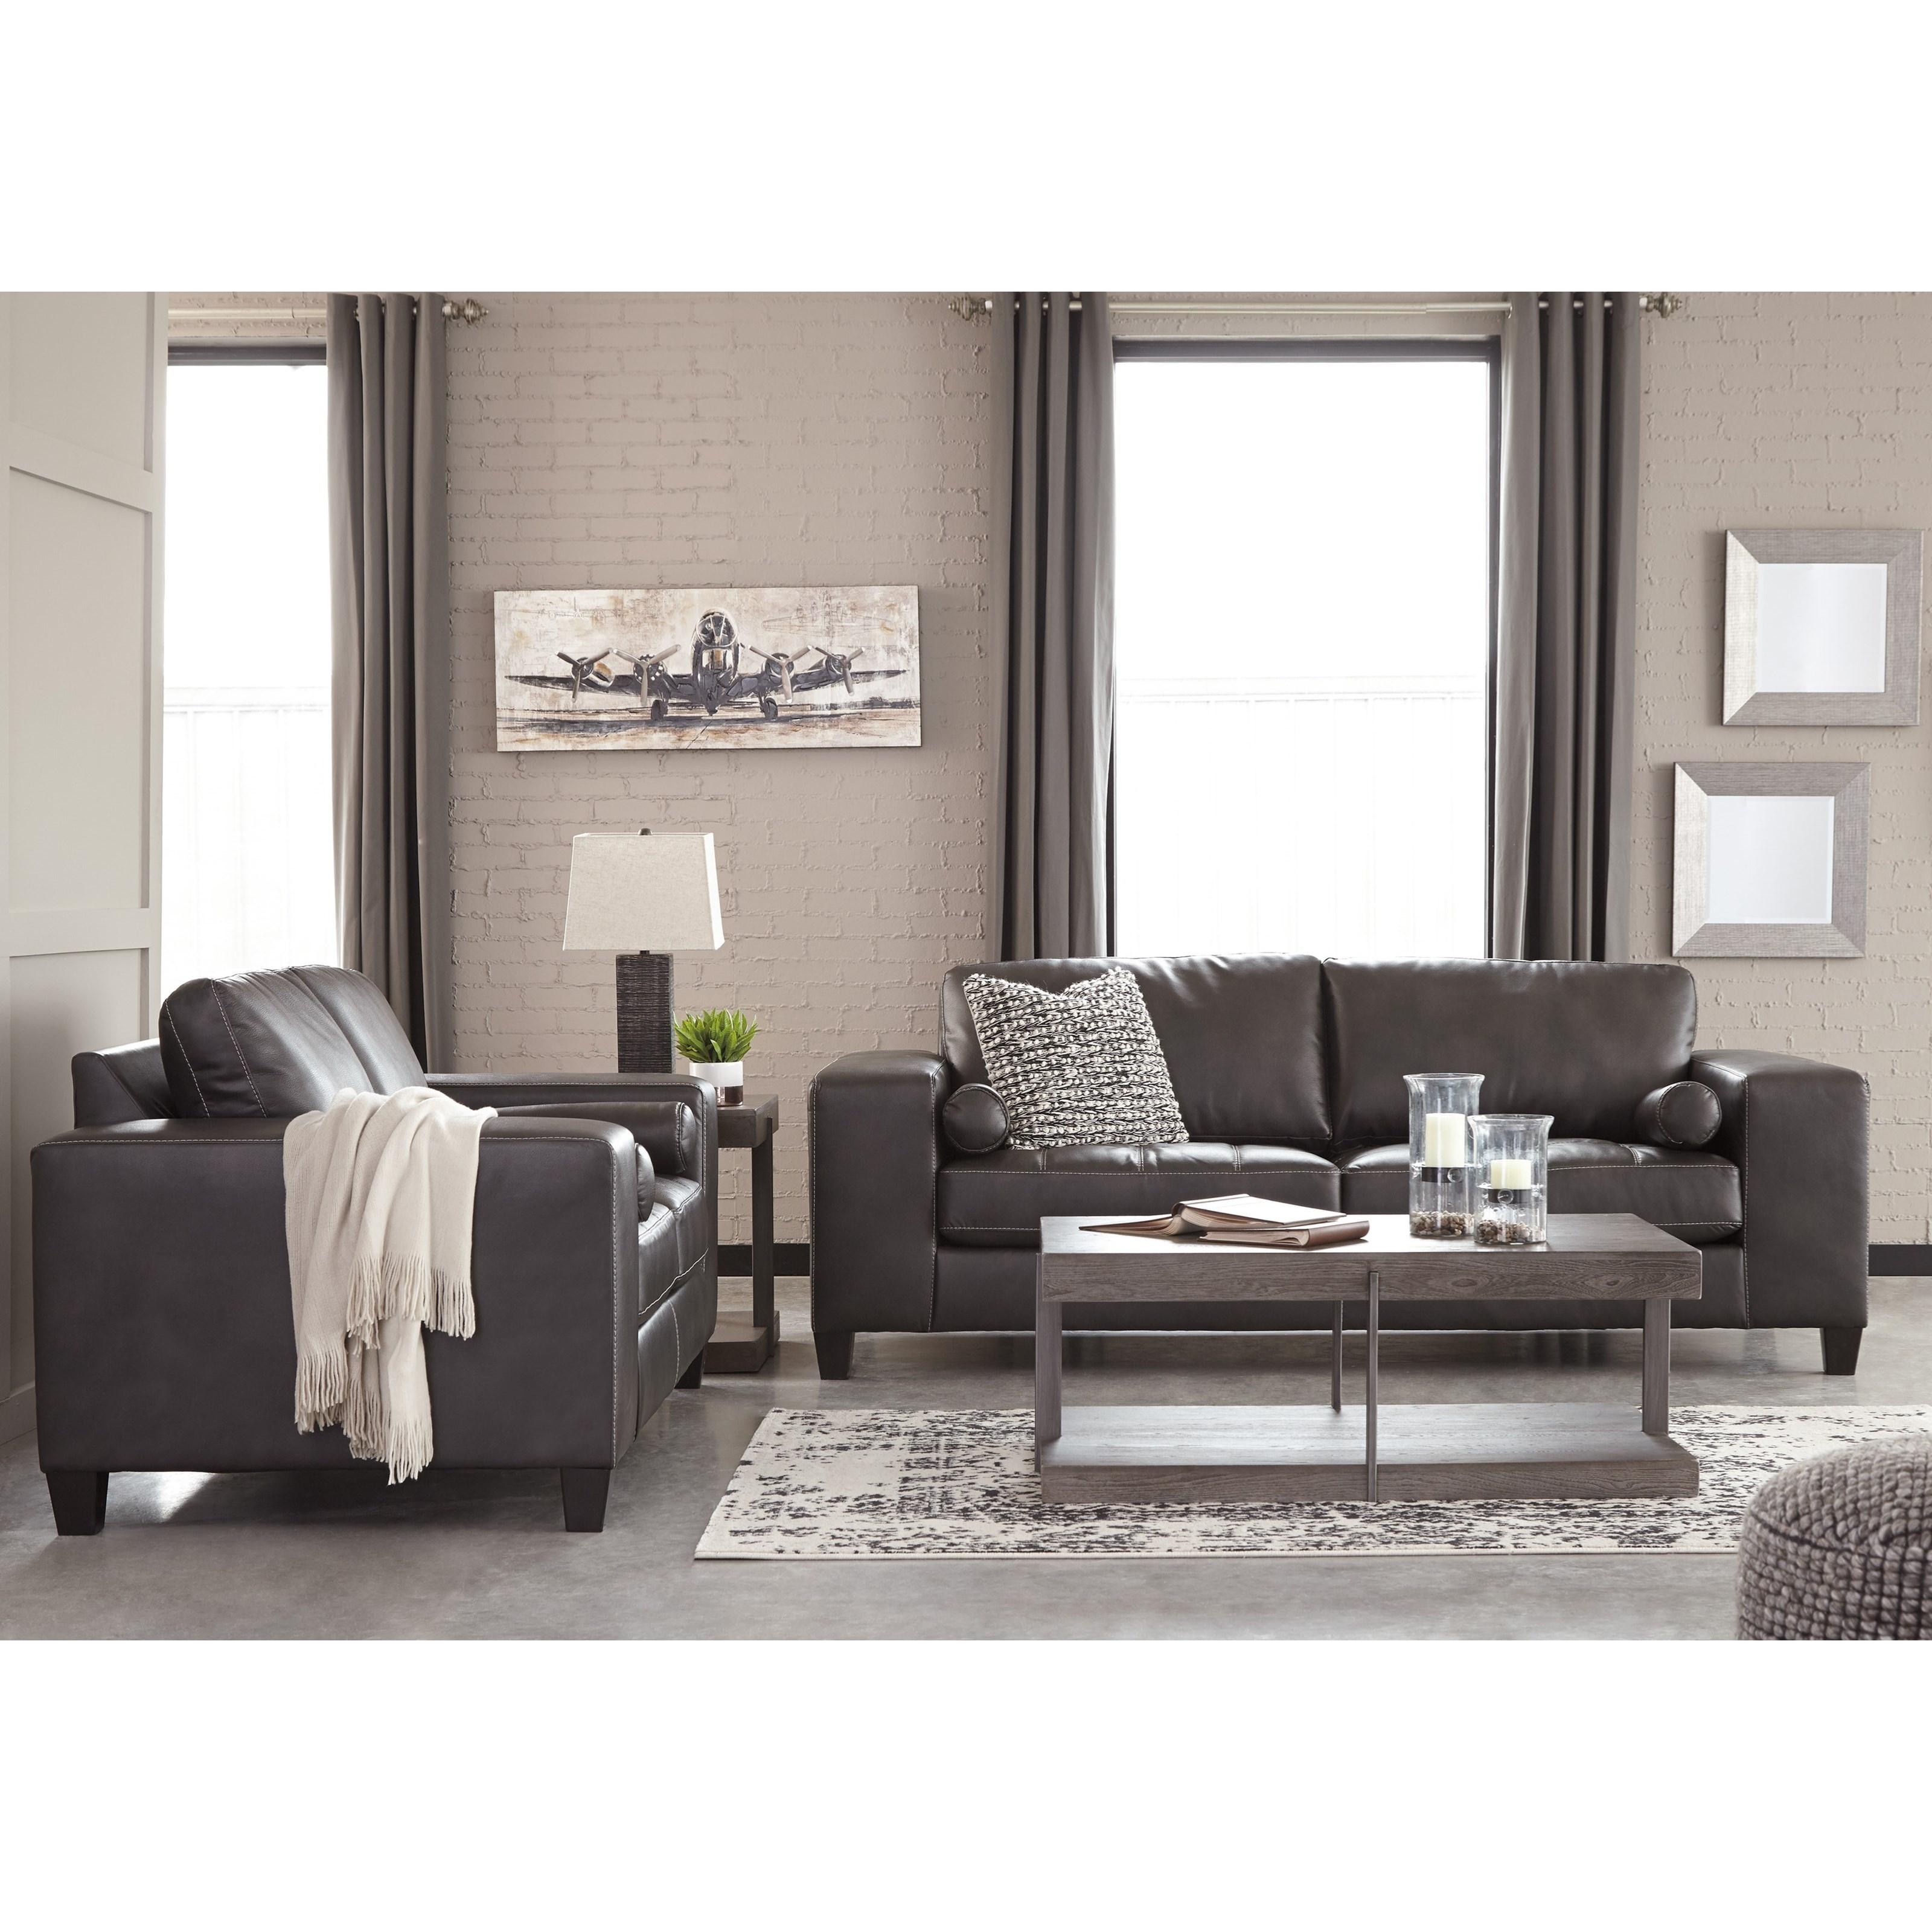 Signature design by ashley nokomis stationary living room for Living room furniture groups